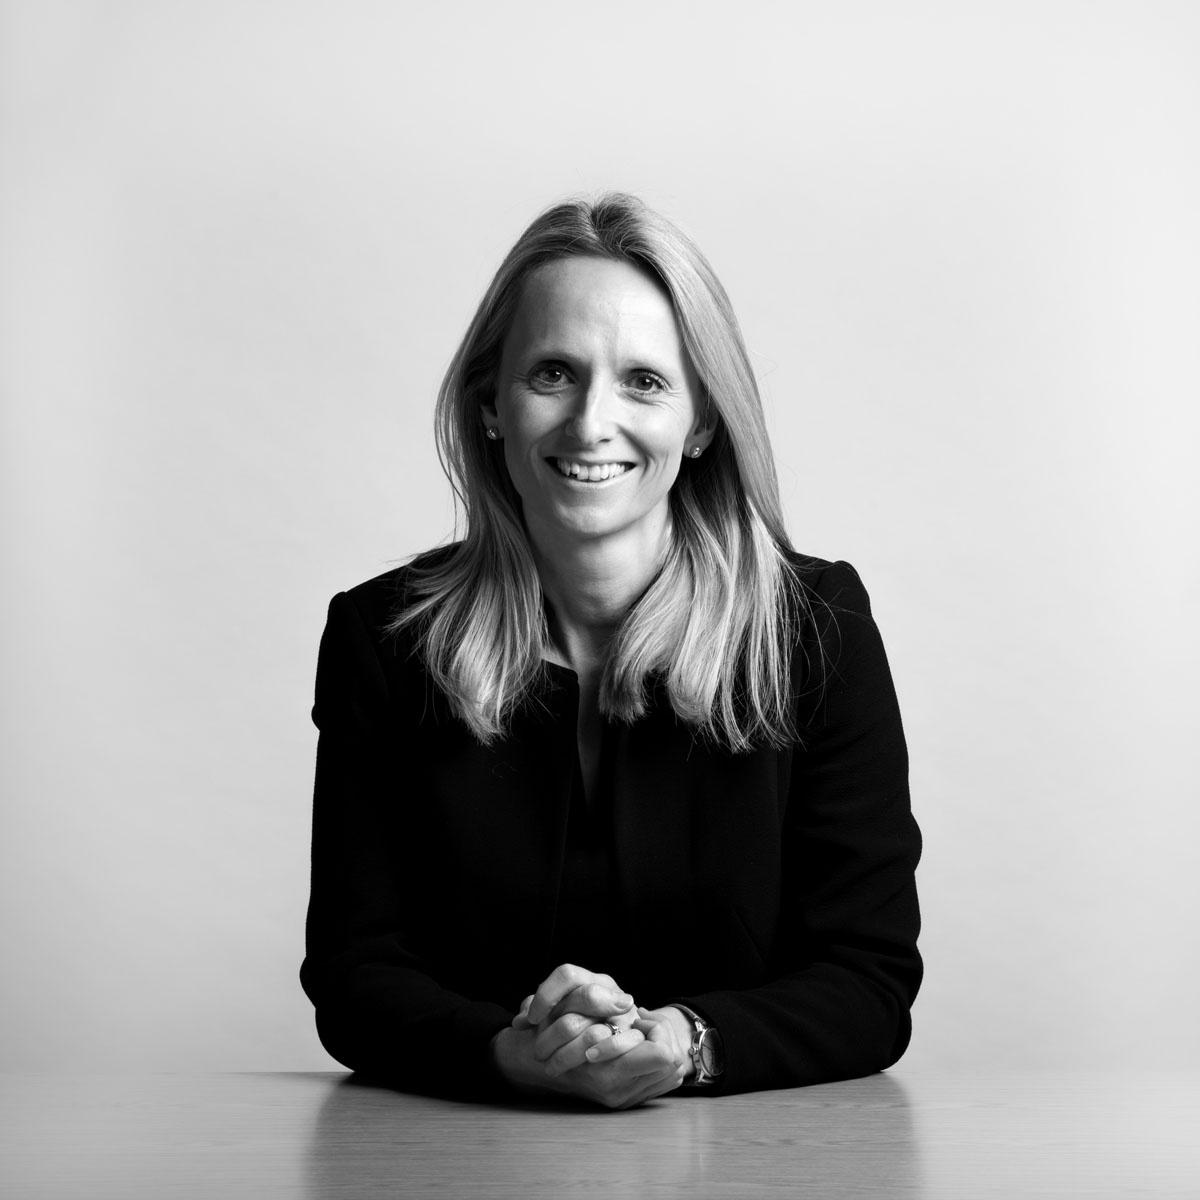 Sharon-Collier